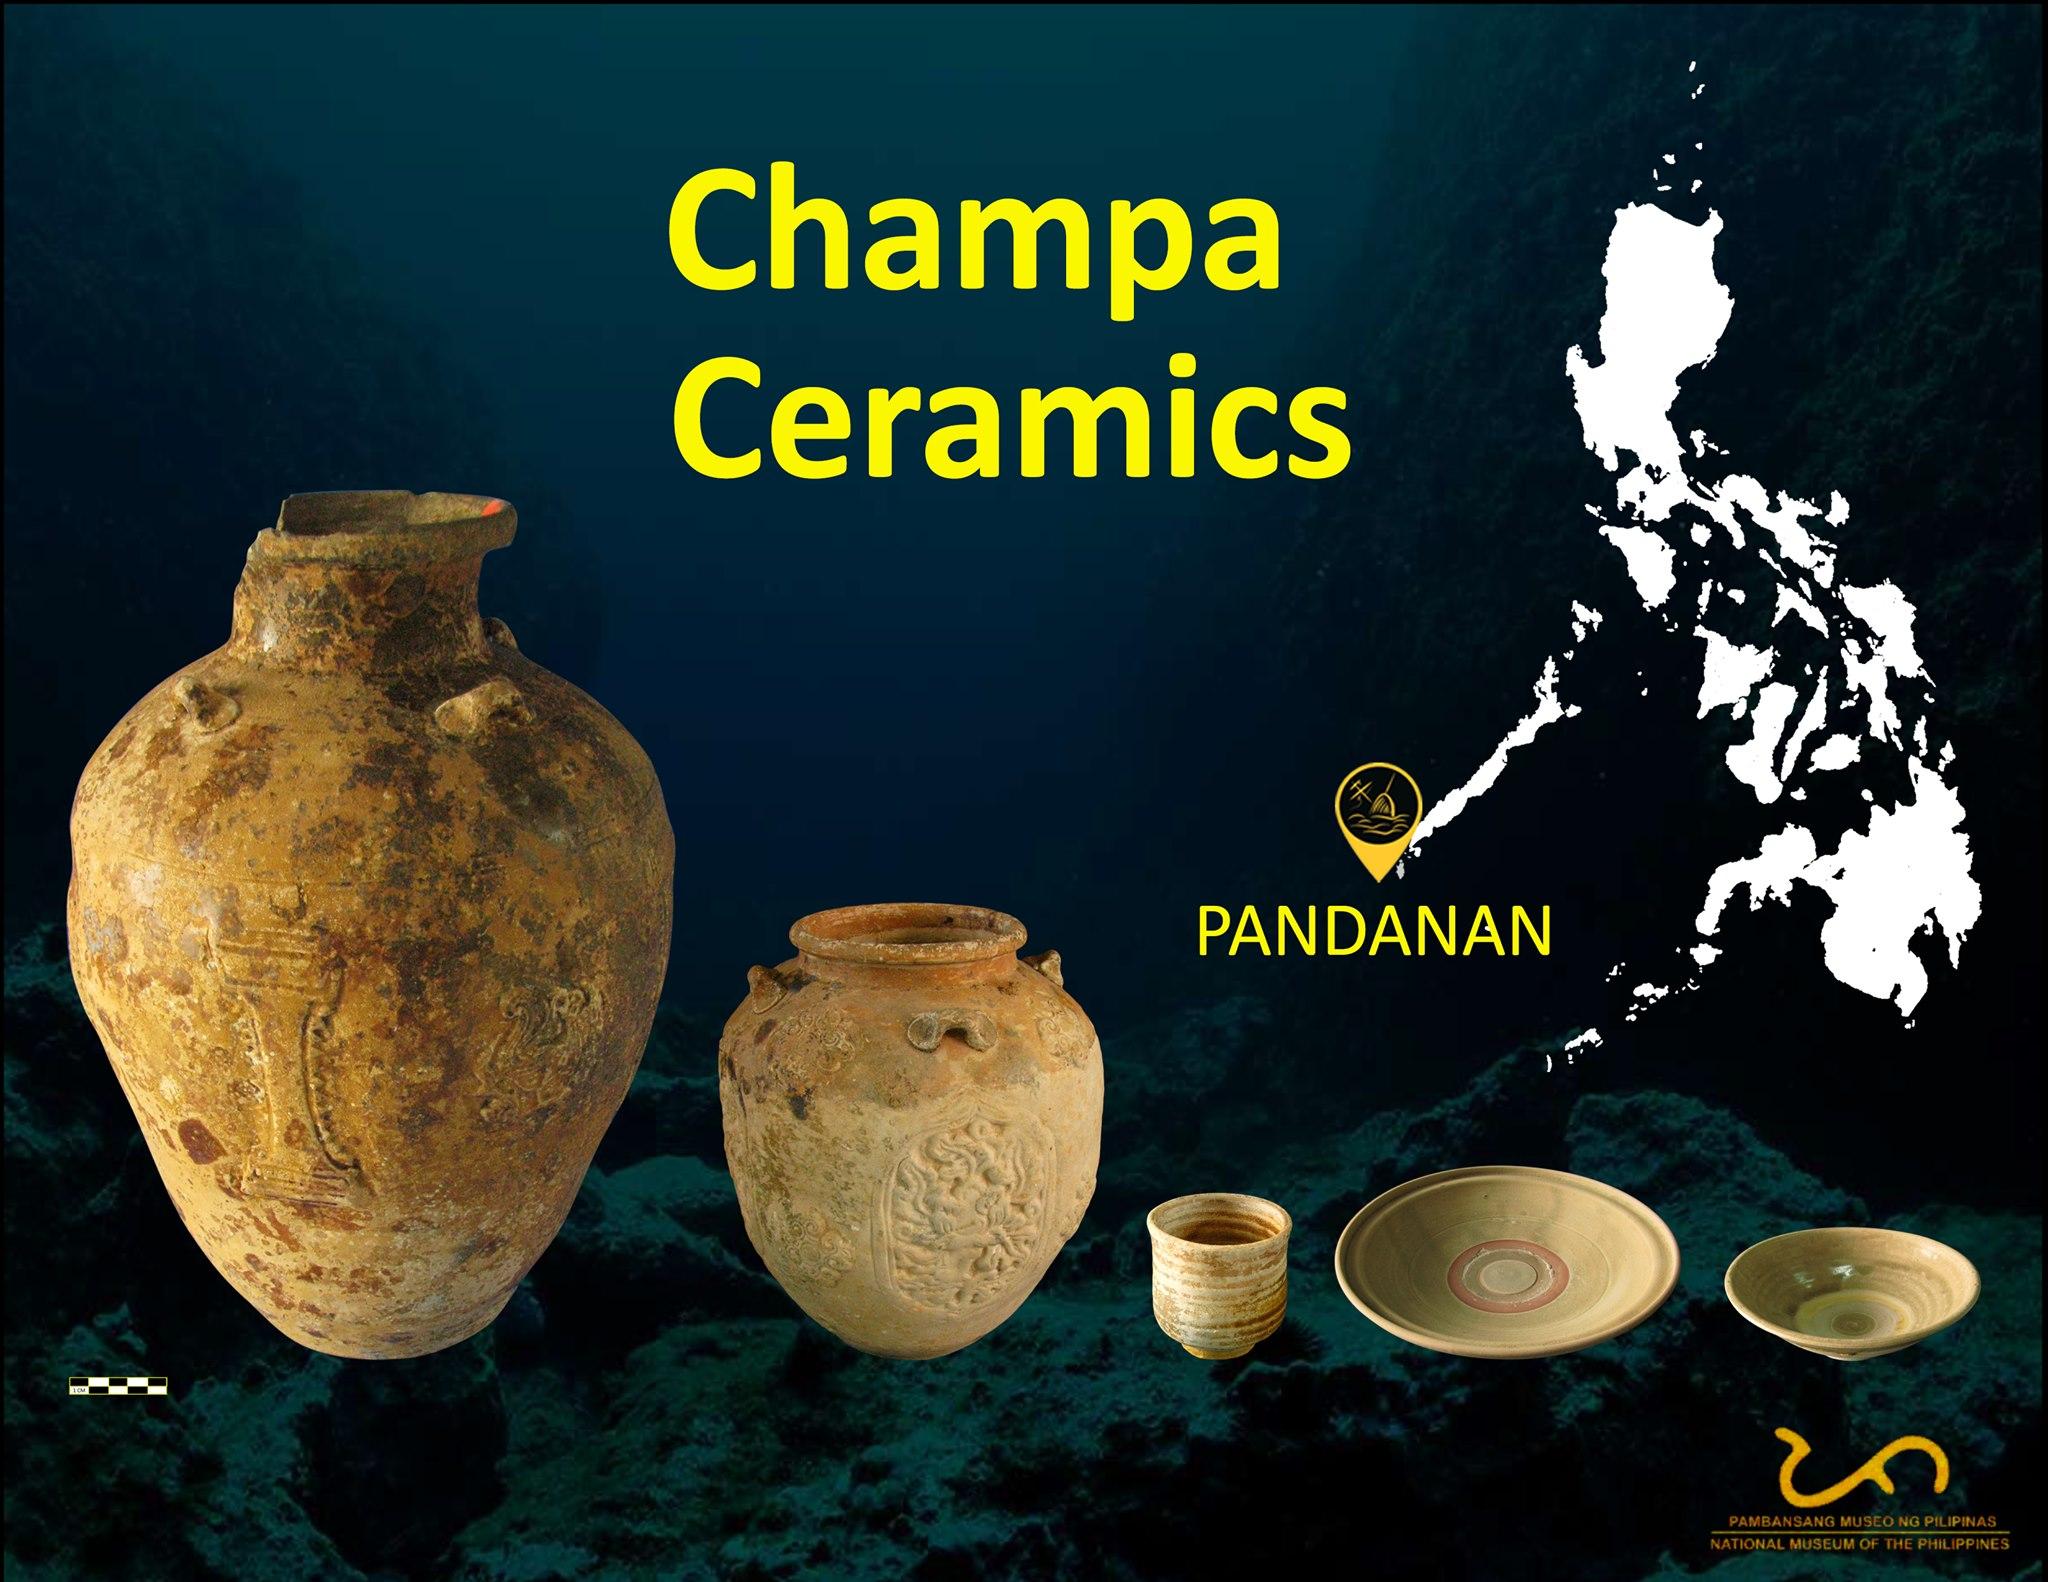 Champa Ceramics